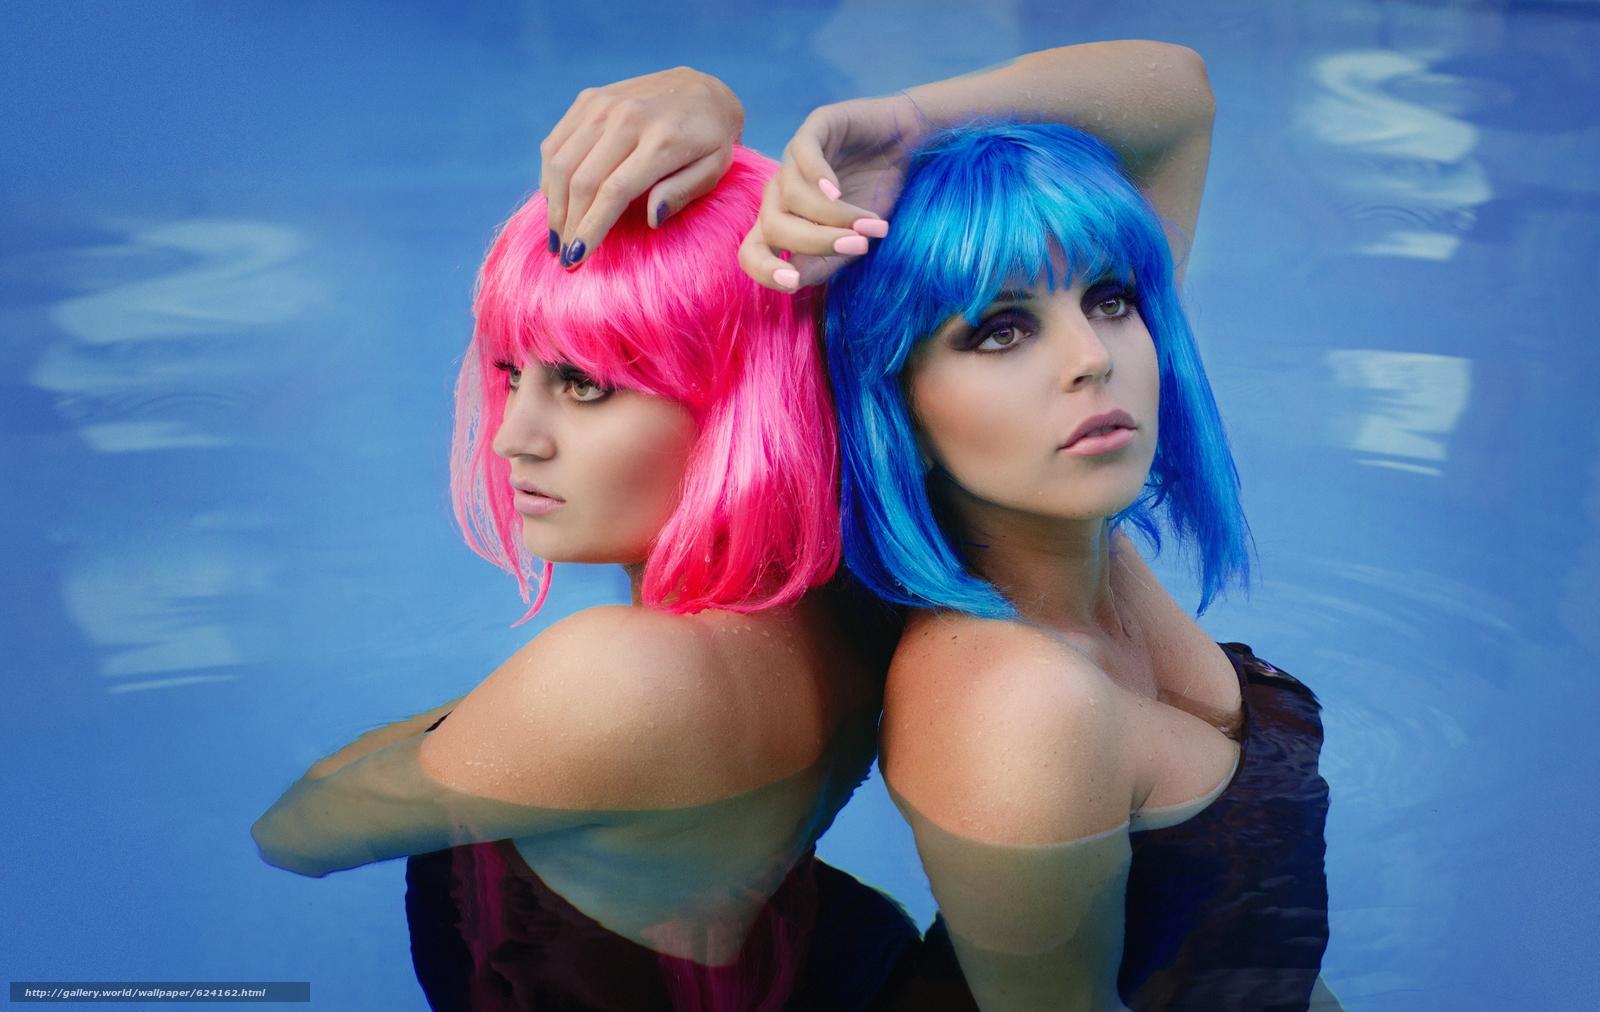 Скачать на телефон обои фото картинку на тему дуэт, поза, парик, рука, вода, разширение 3600x2276